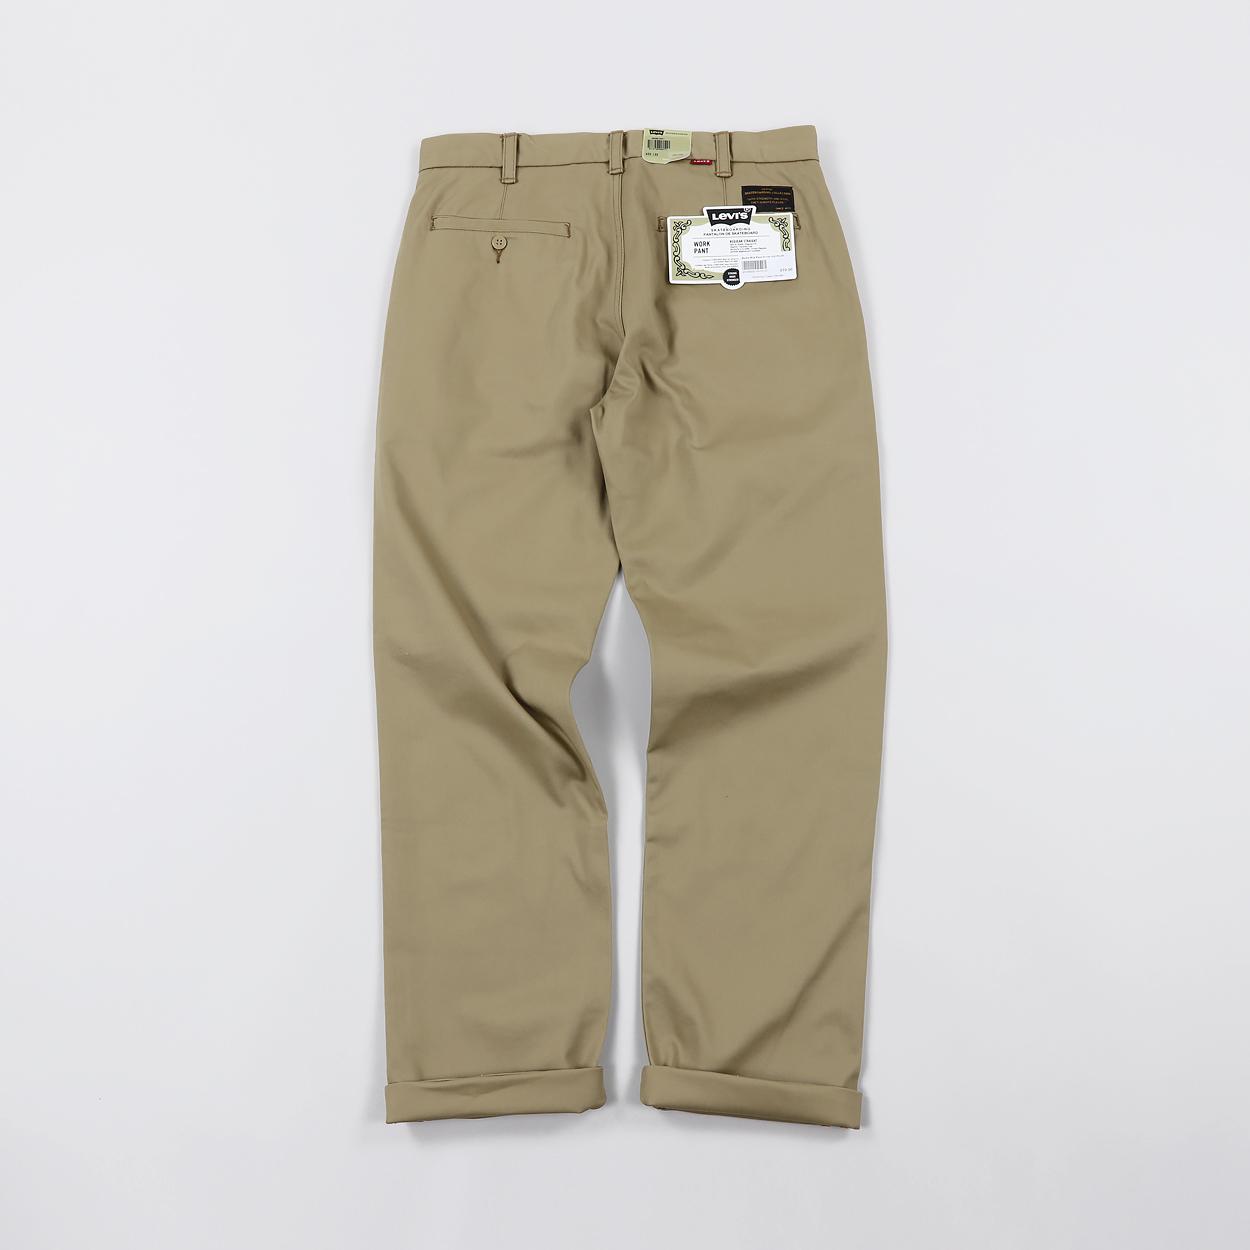 e214117fdcb Levis Skate Work Pant Harvest Gold Board Wear Mens Jeans £59.00